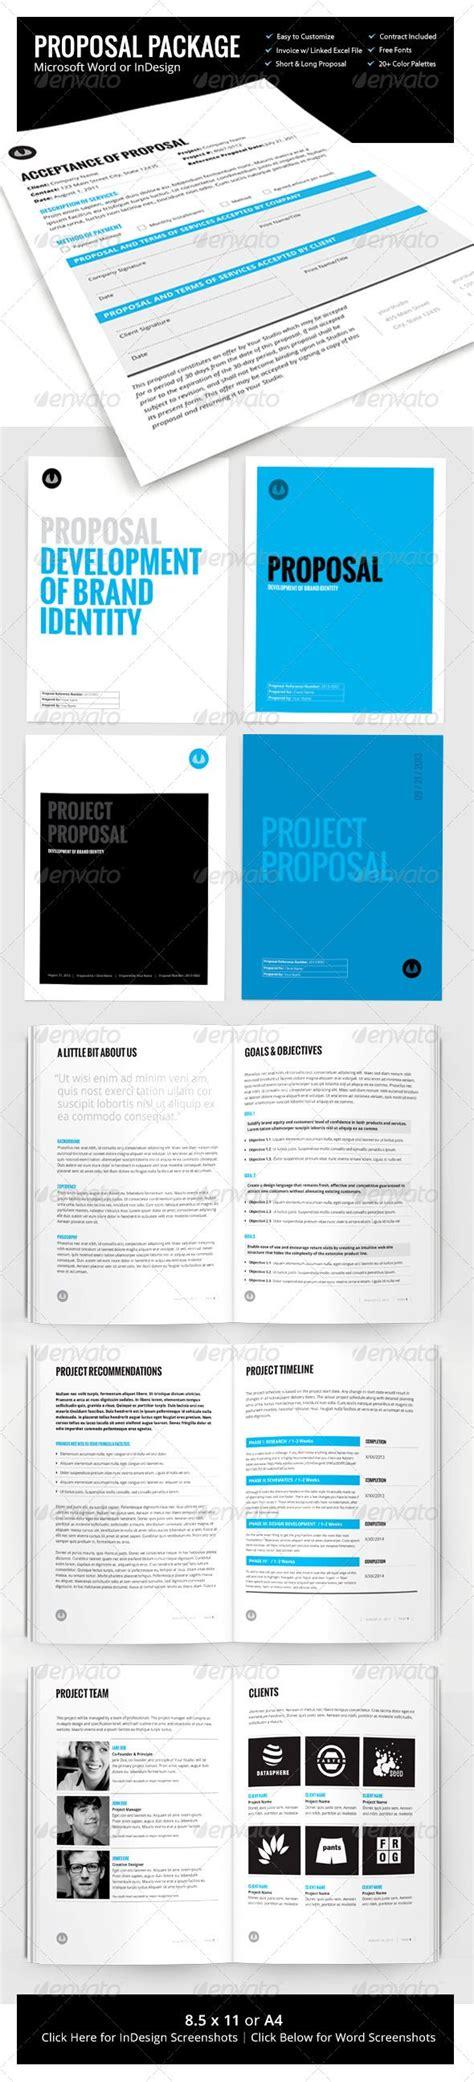 free basic resume templates microsoft word elegant resume format